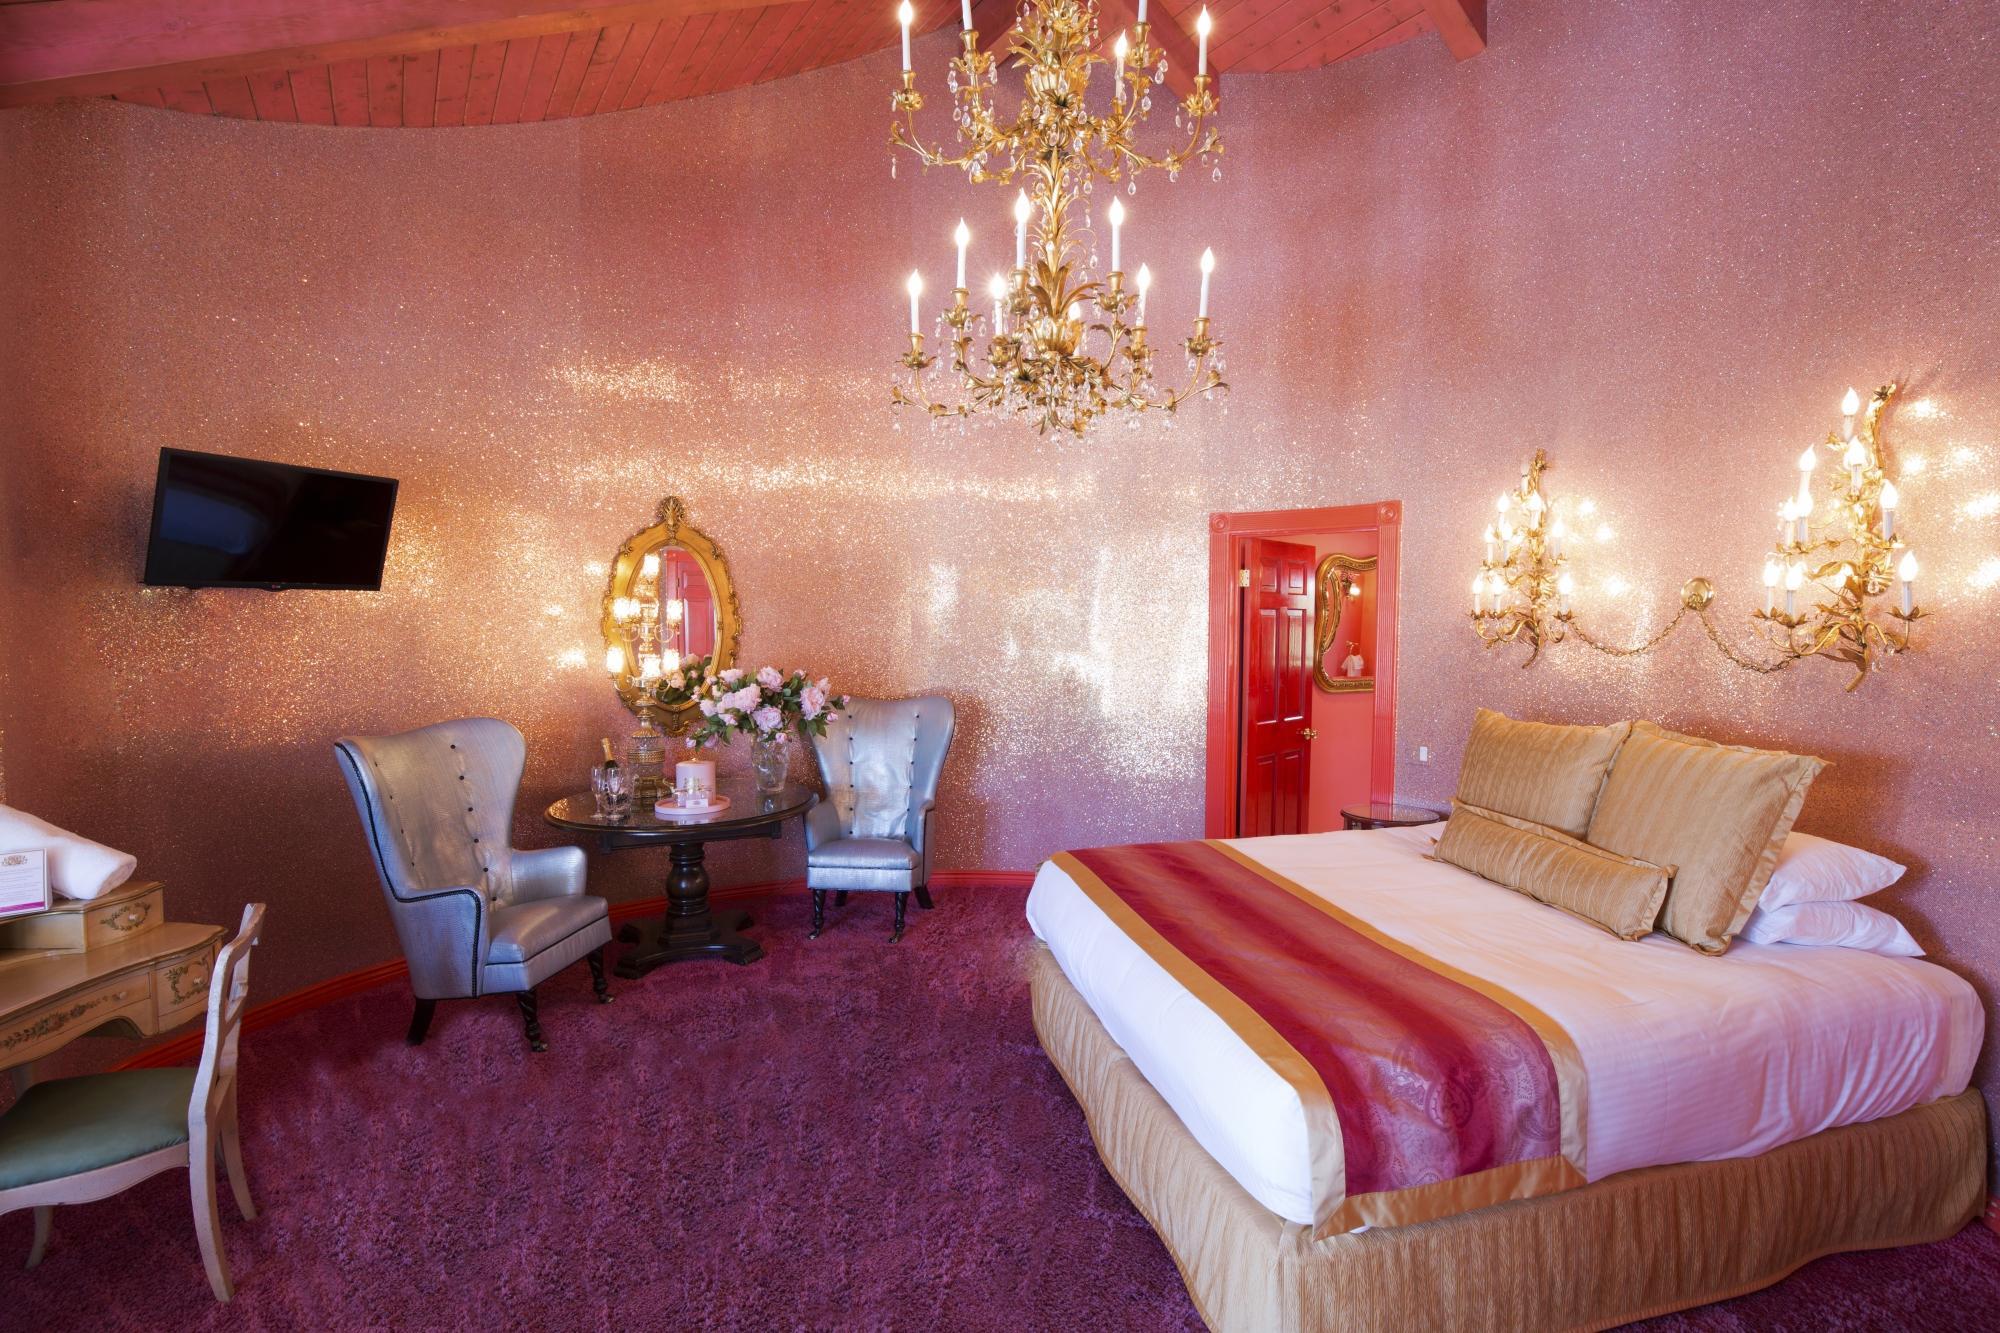 Madonna Inn (San Luis Obispo, CA) 2018 Hotel Review & Ratings ...